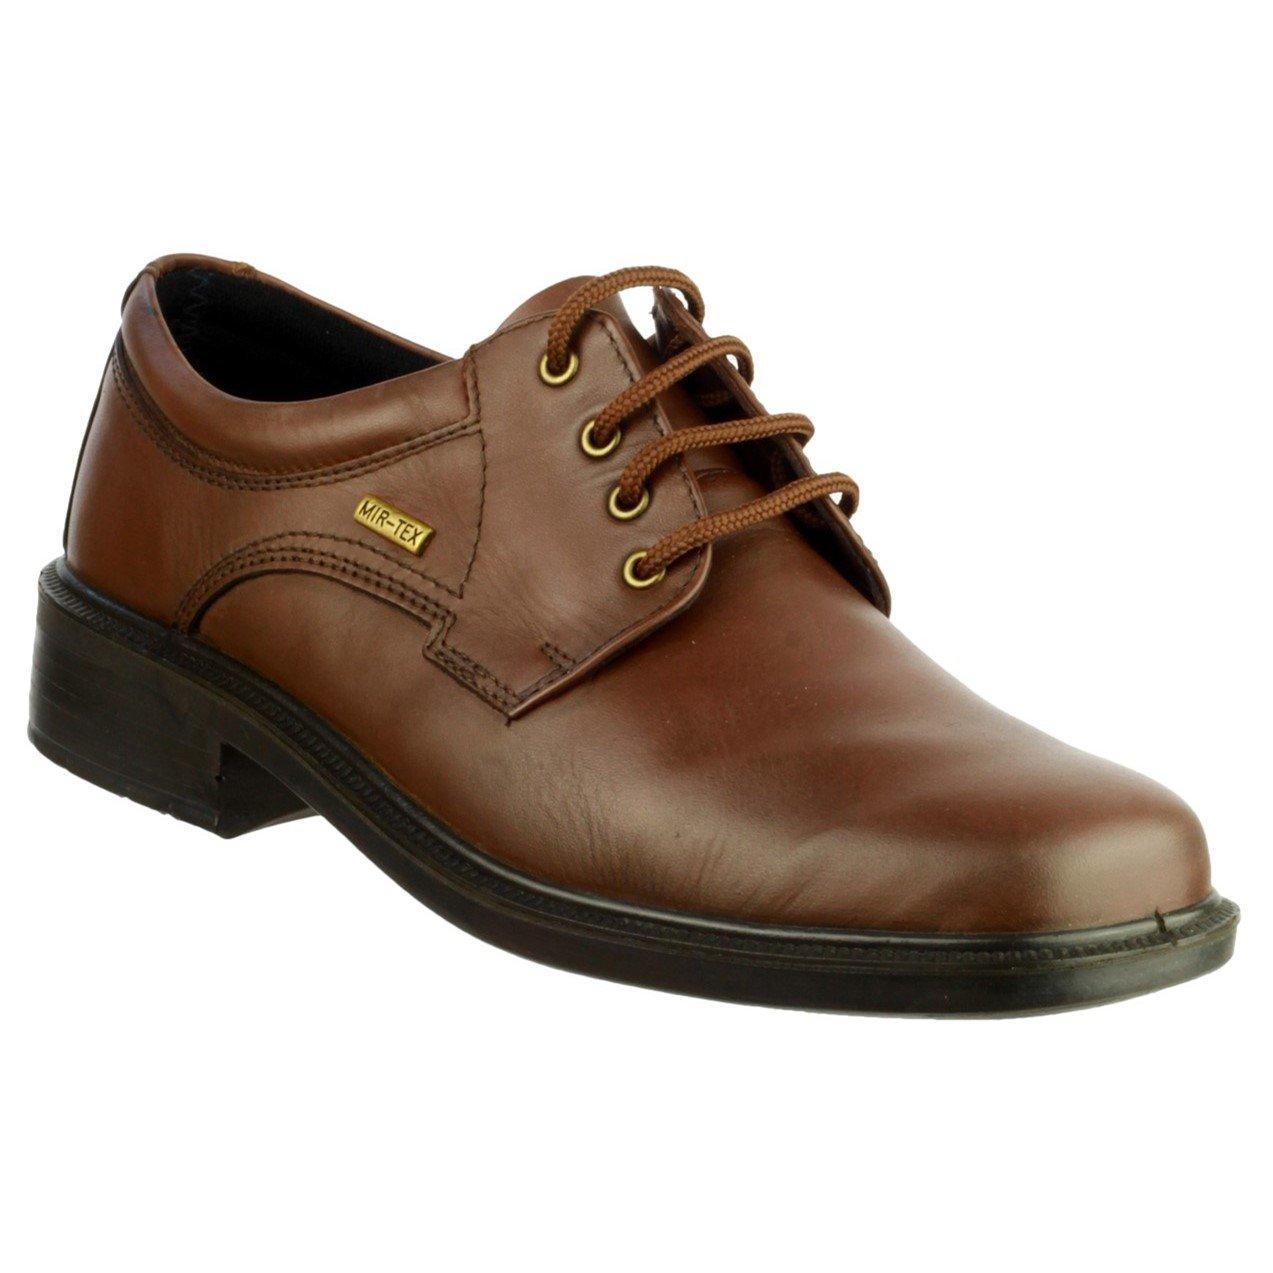 Cotswold Men's Sudeley Waterproof Shoe Various Colours 32970 - Brown 12